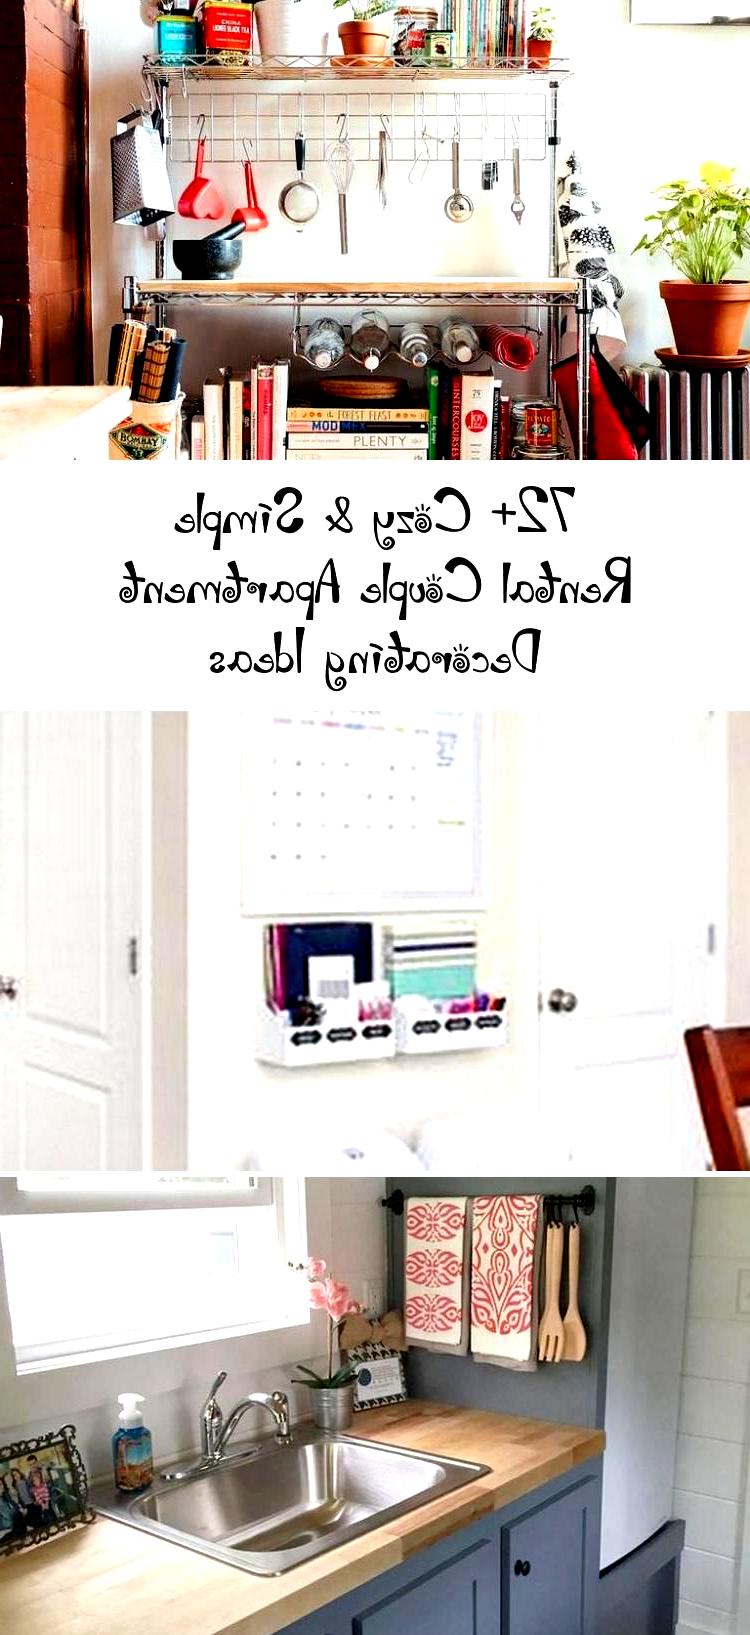 72+ Cozy & Simple Rental Couple Apartment Decorating Ideas #apartment #apartment...